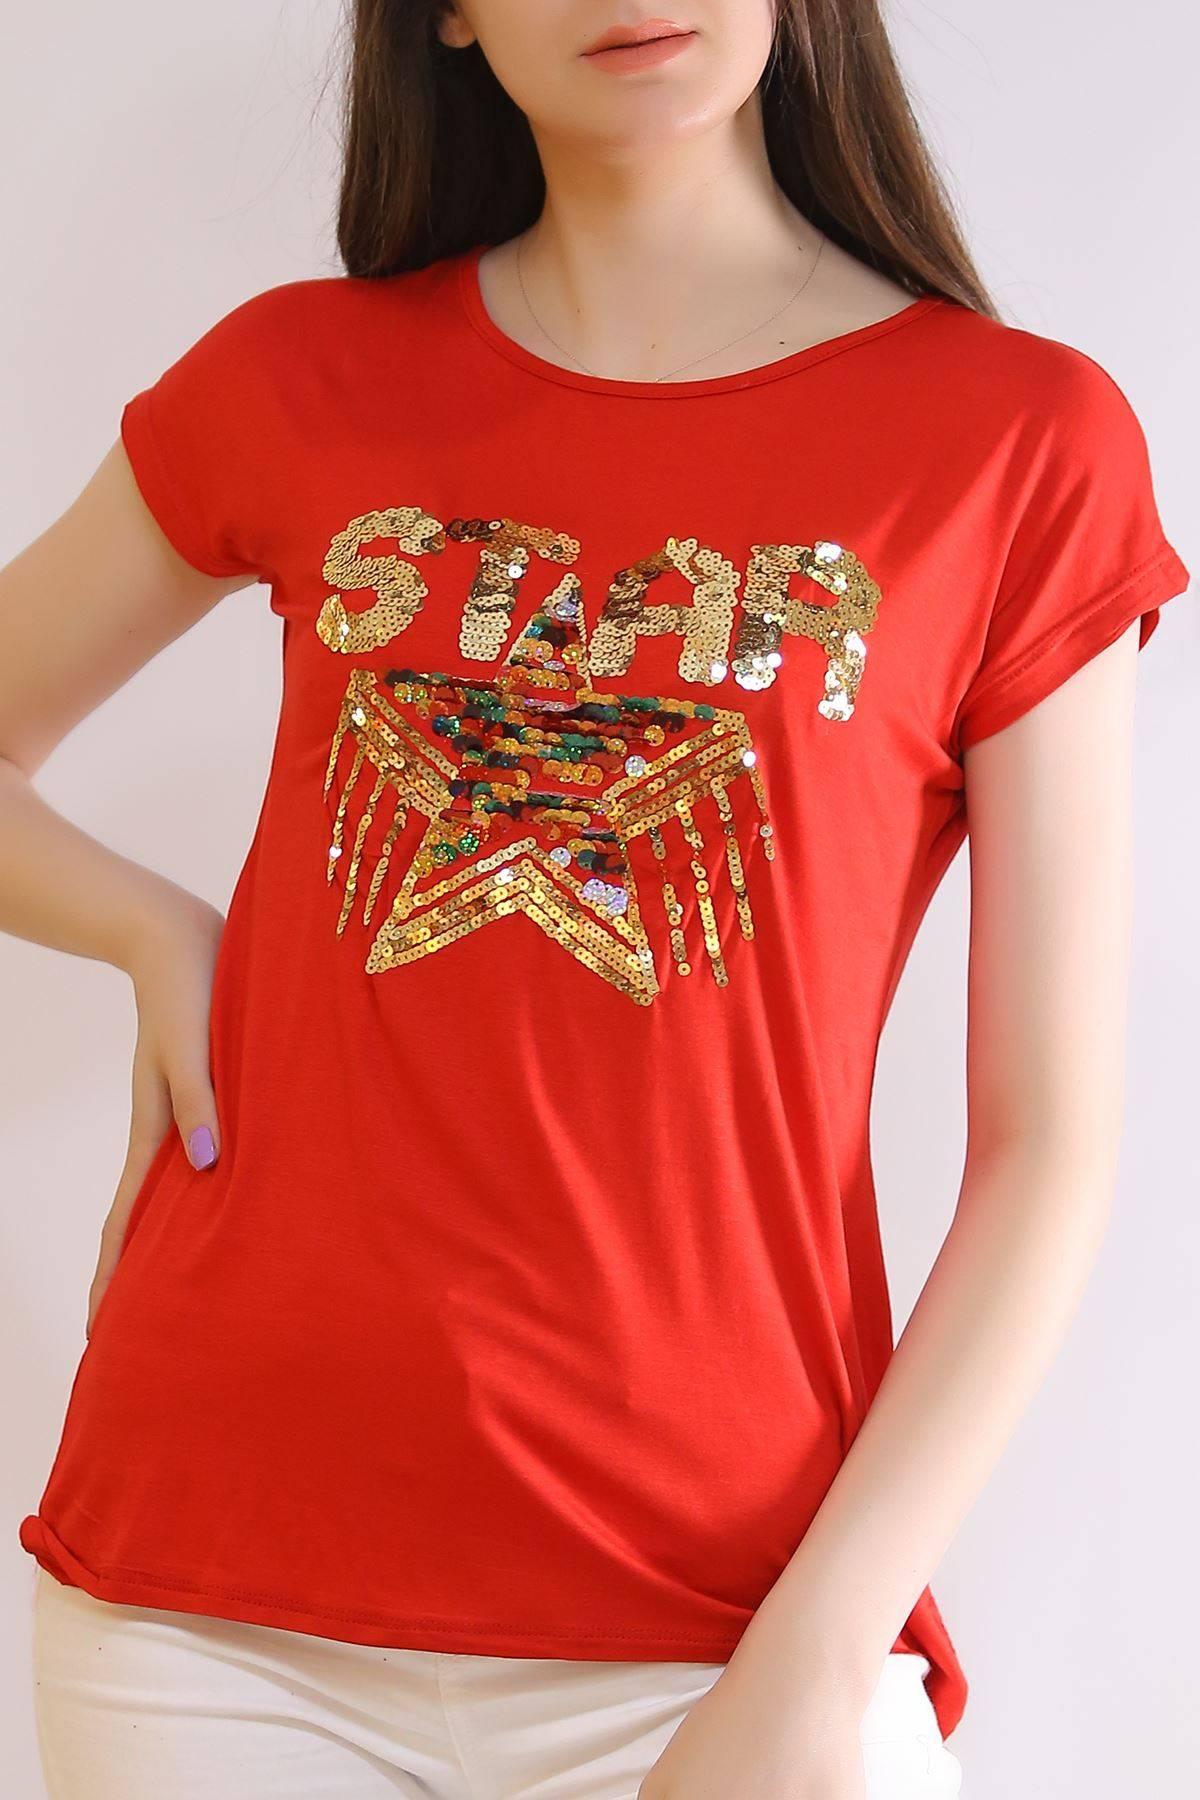 Star Baskı Tişört Kırmızı - 6522.599.